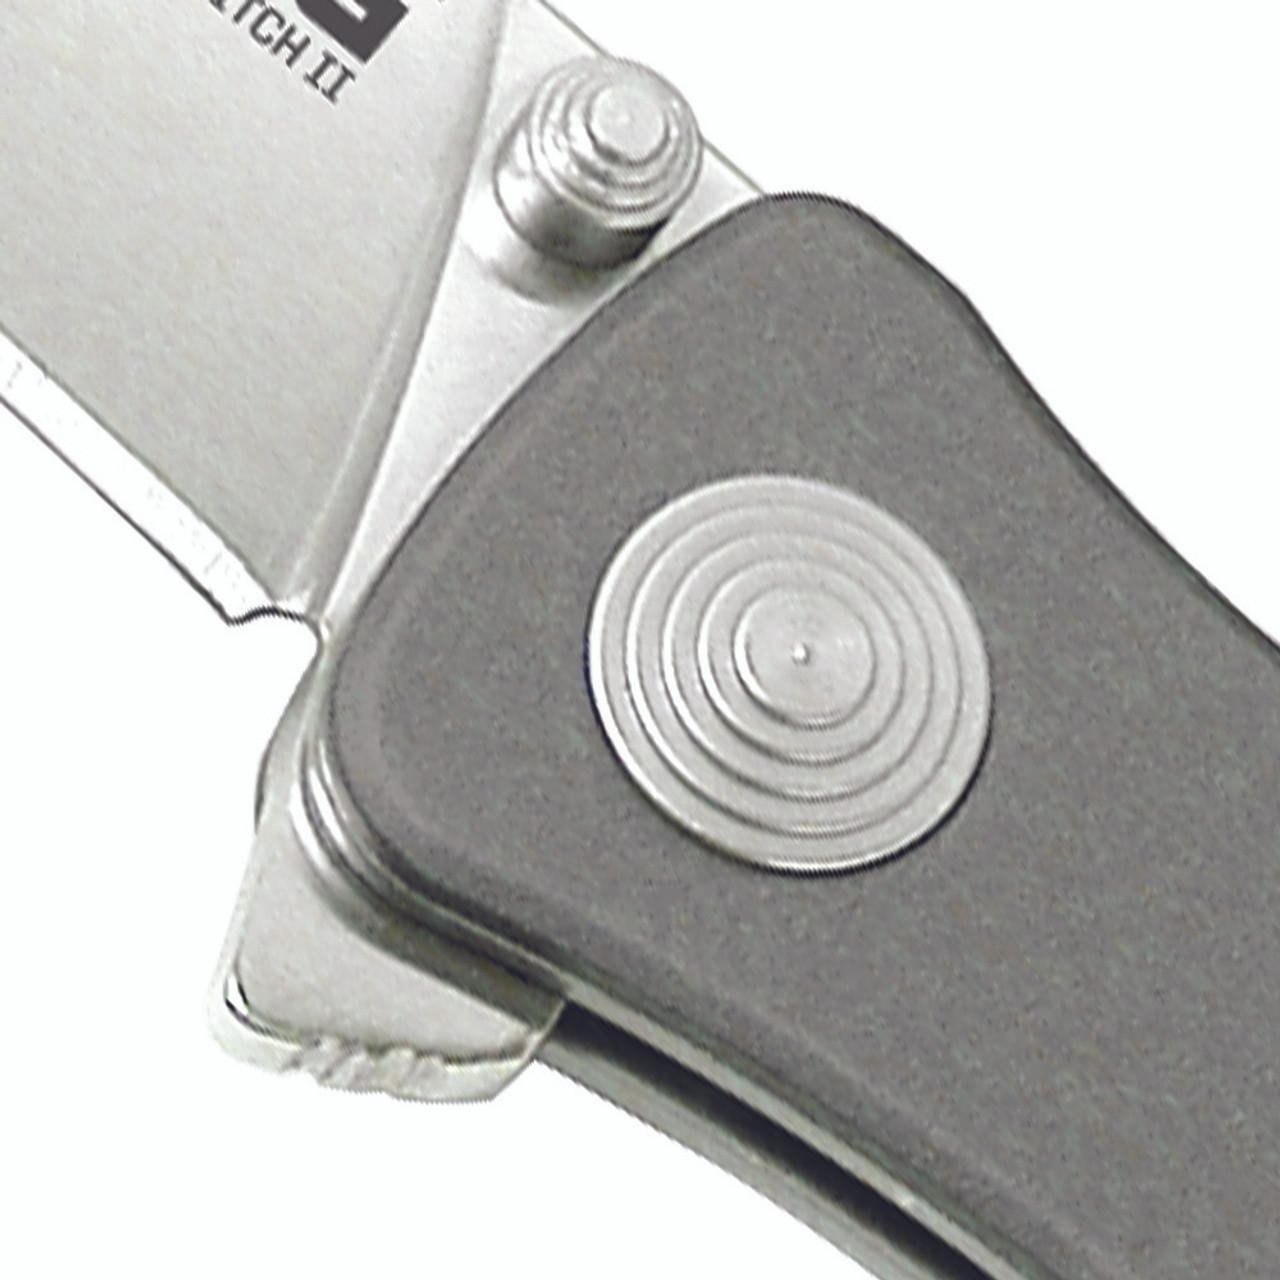 Twitch II-Drop Point, Satin, Aluminum Handle